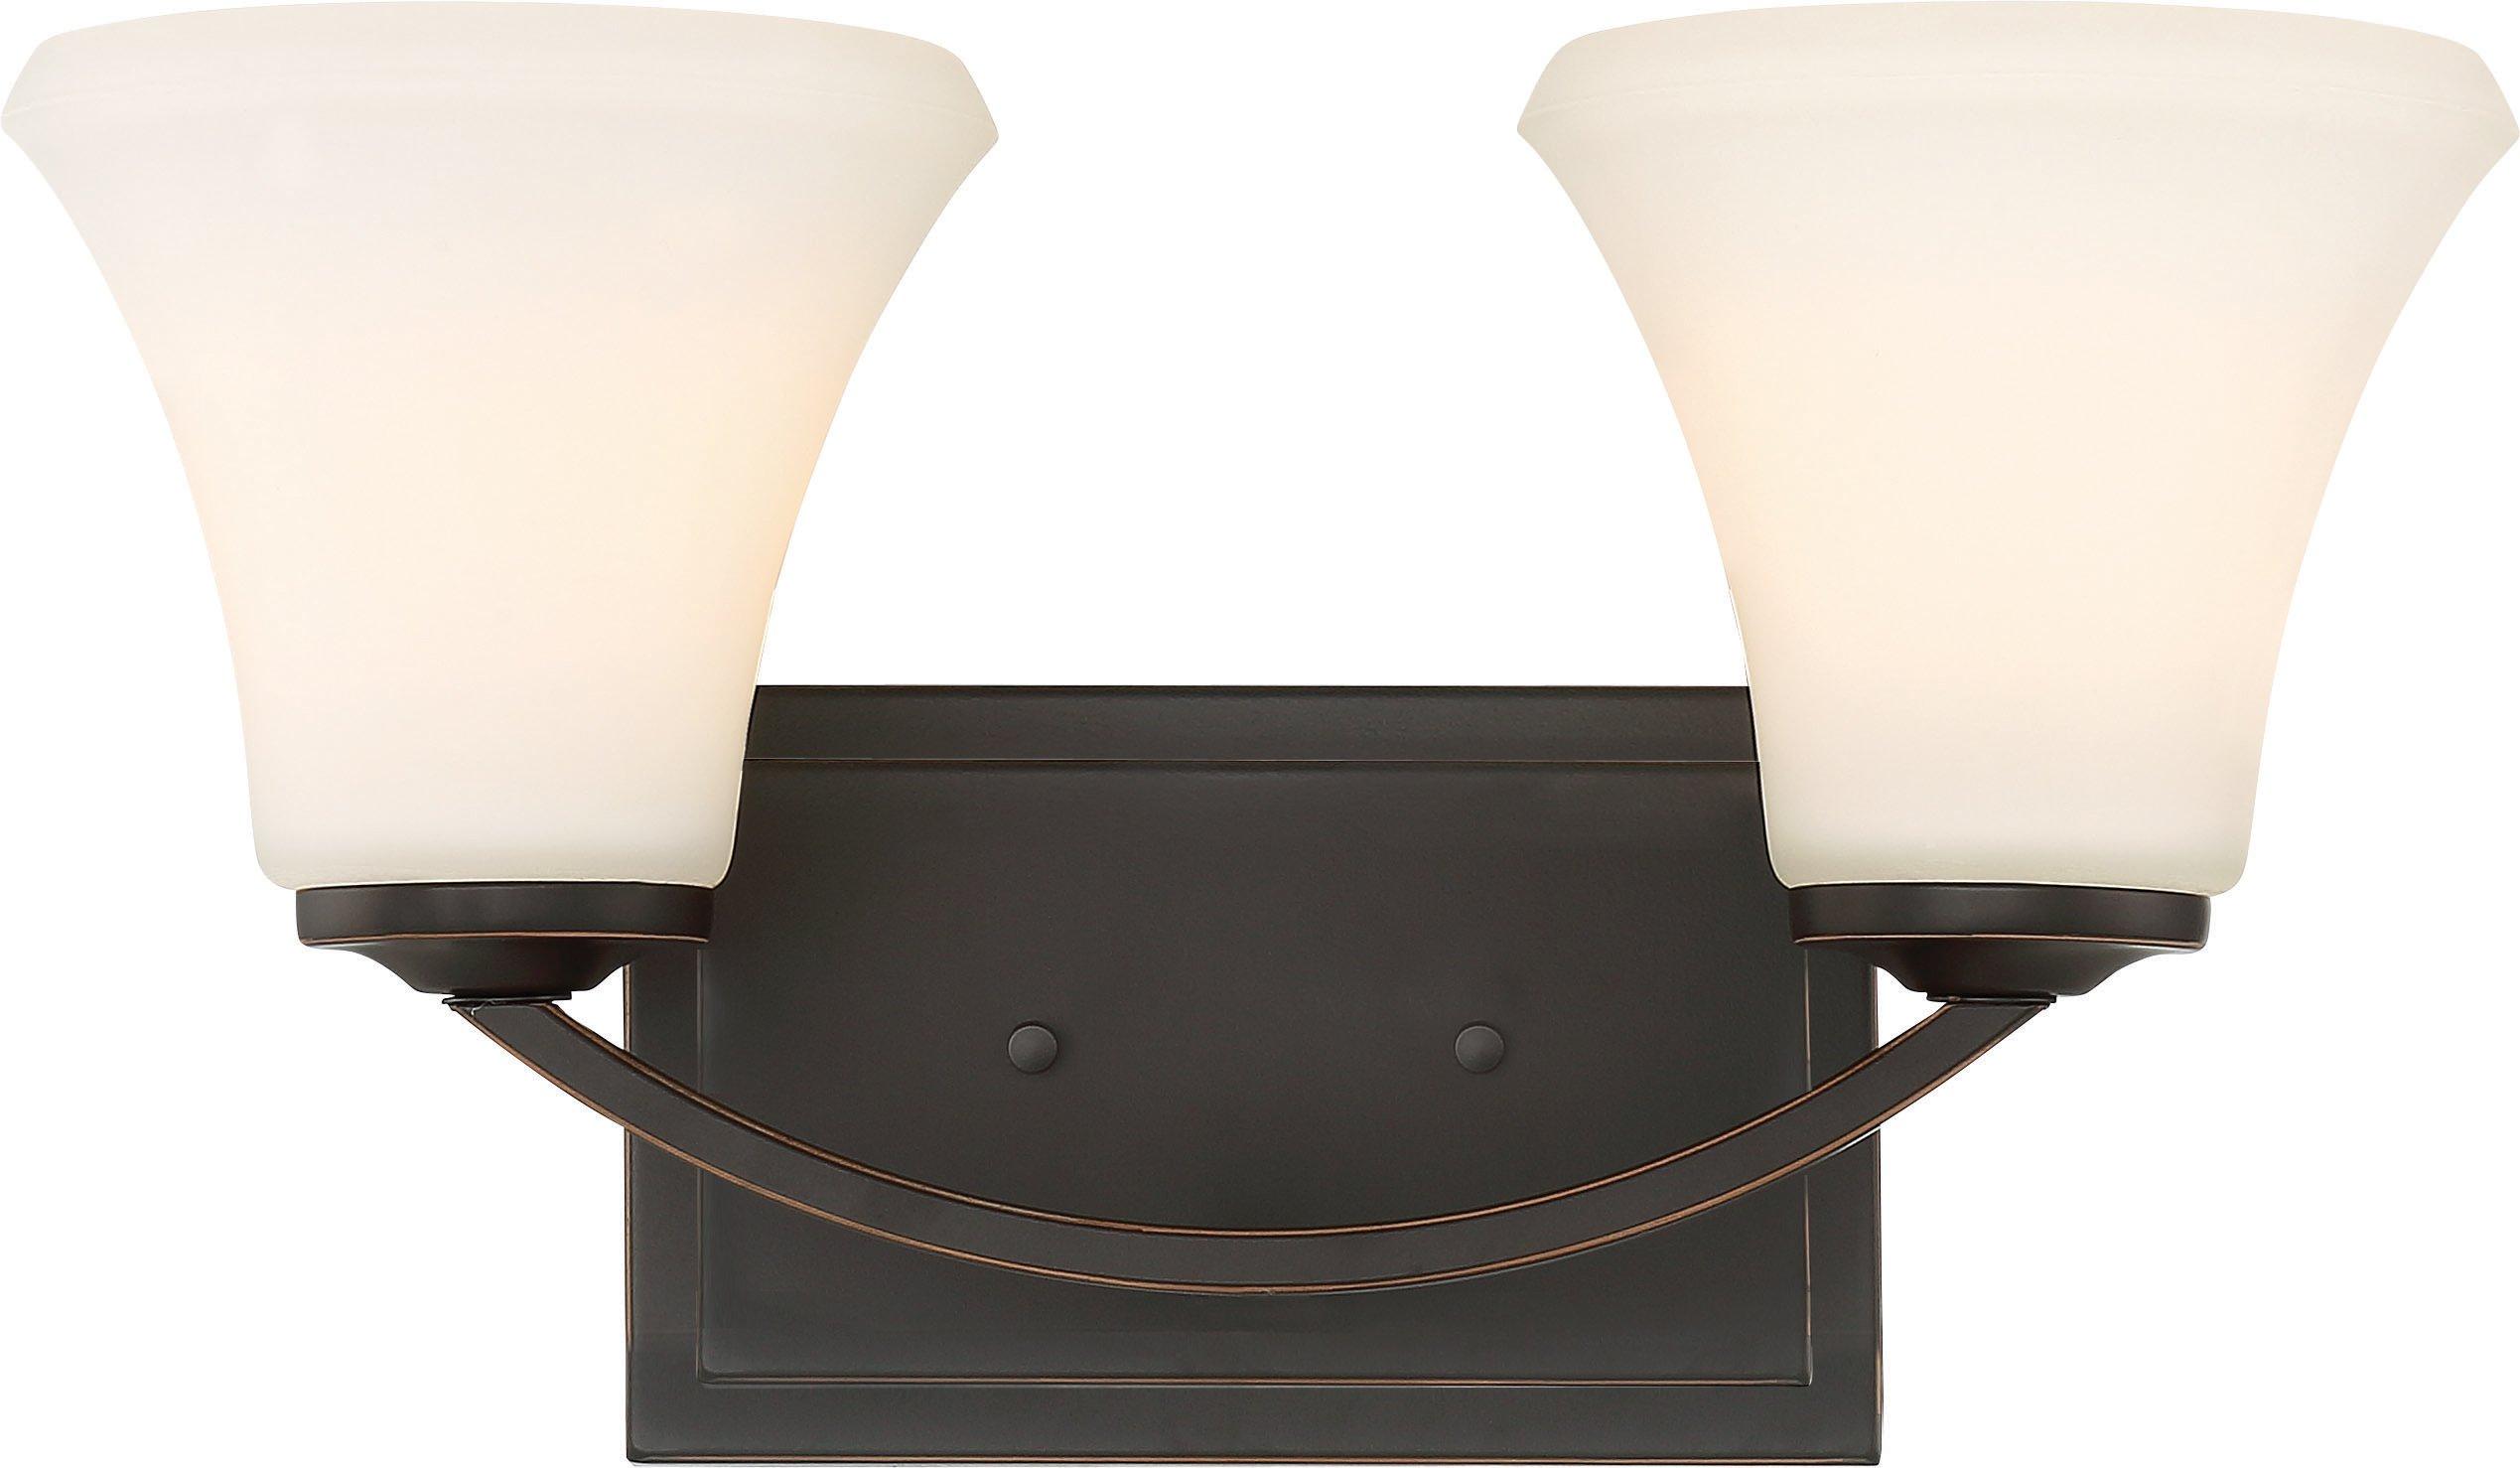 Nuvo Lighting 60/6302 Fawn 2 Vanity Fixture - Mahogany Bronze Finish